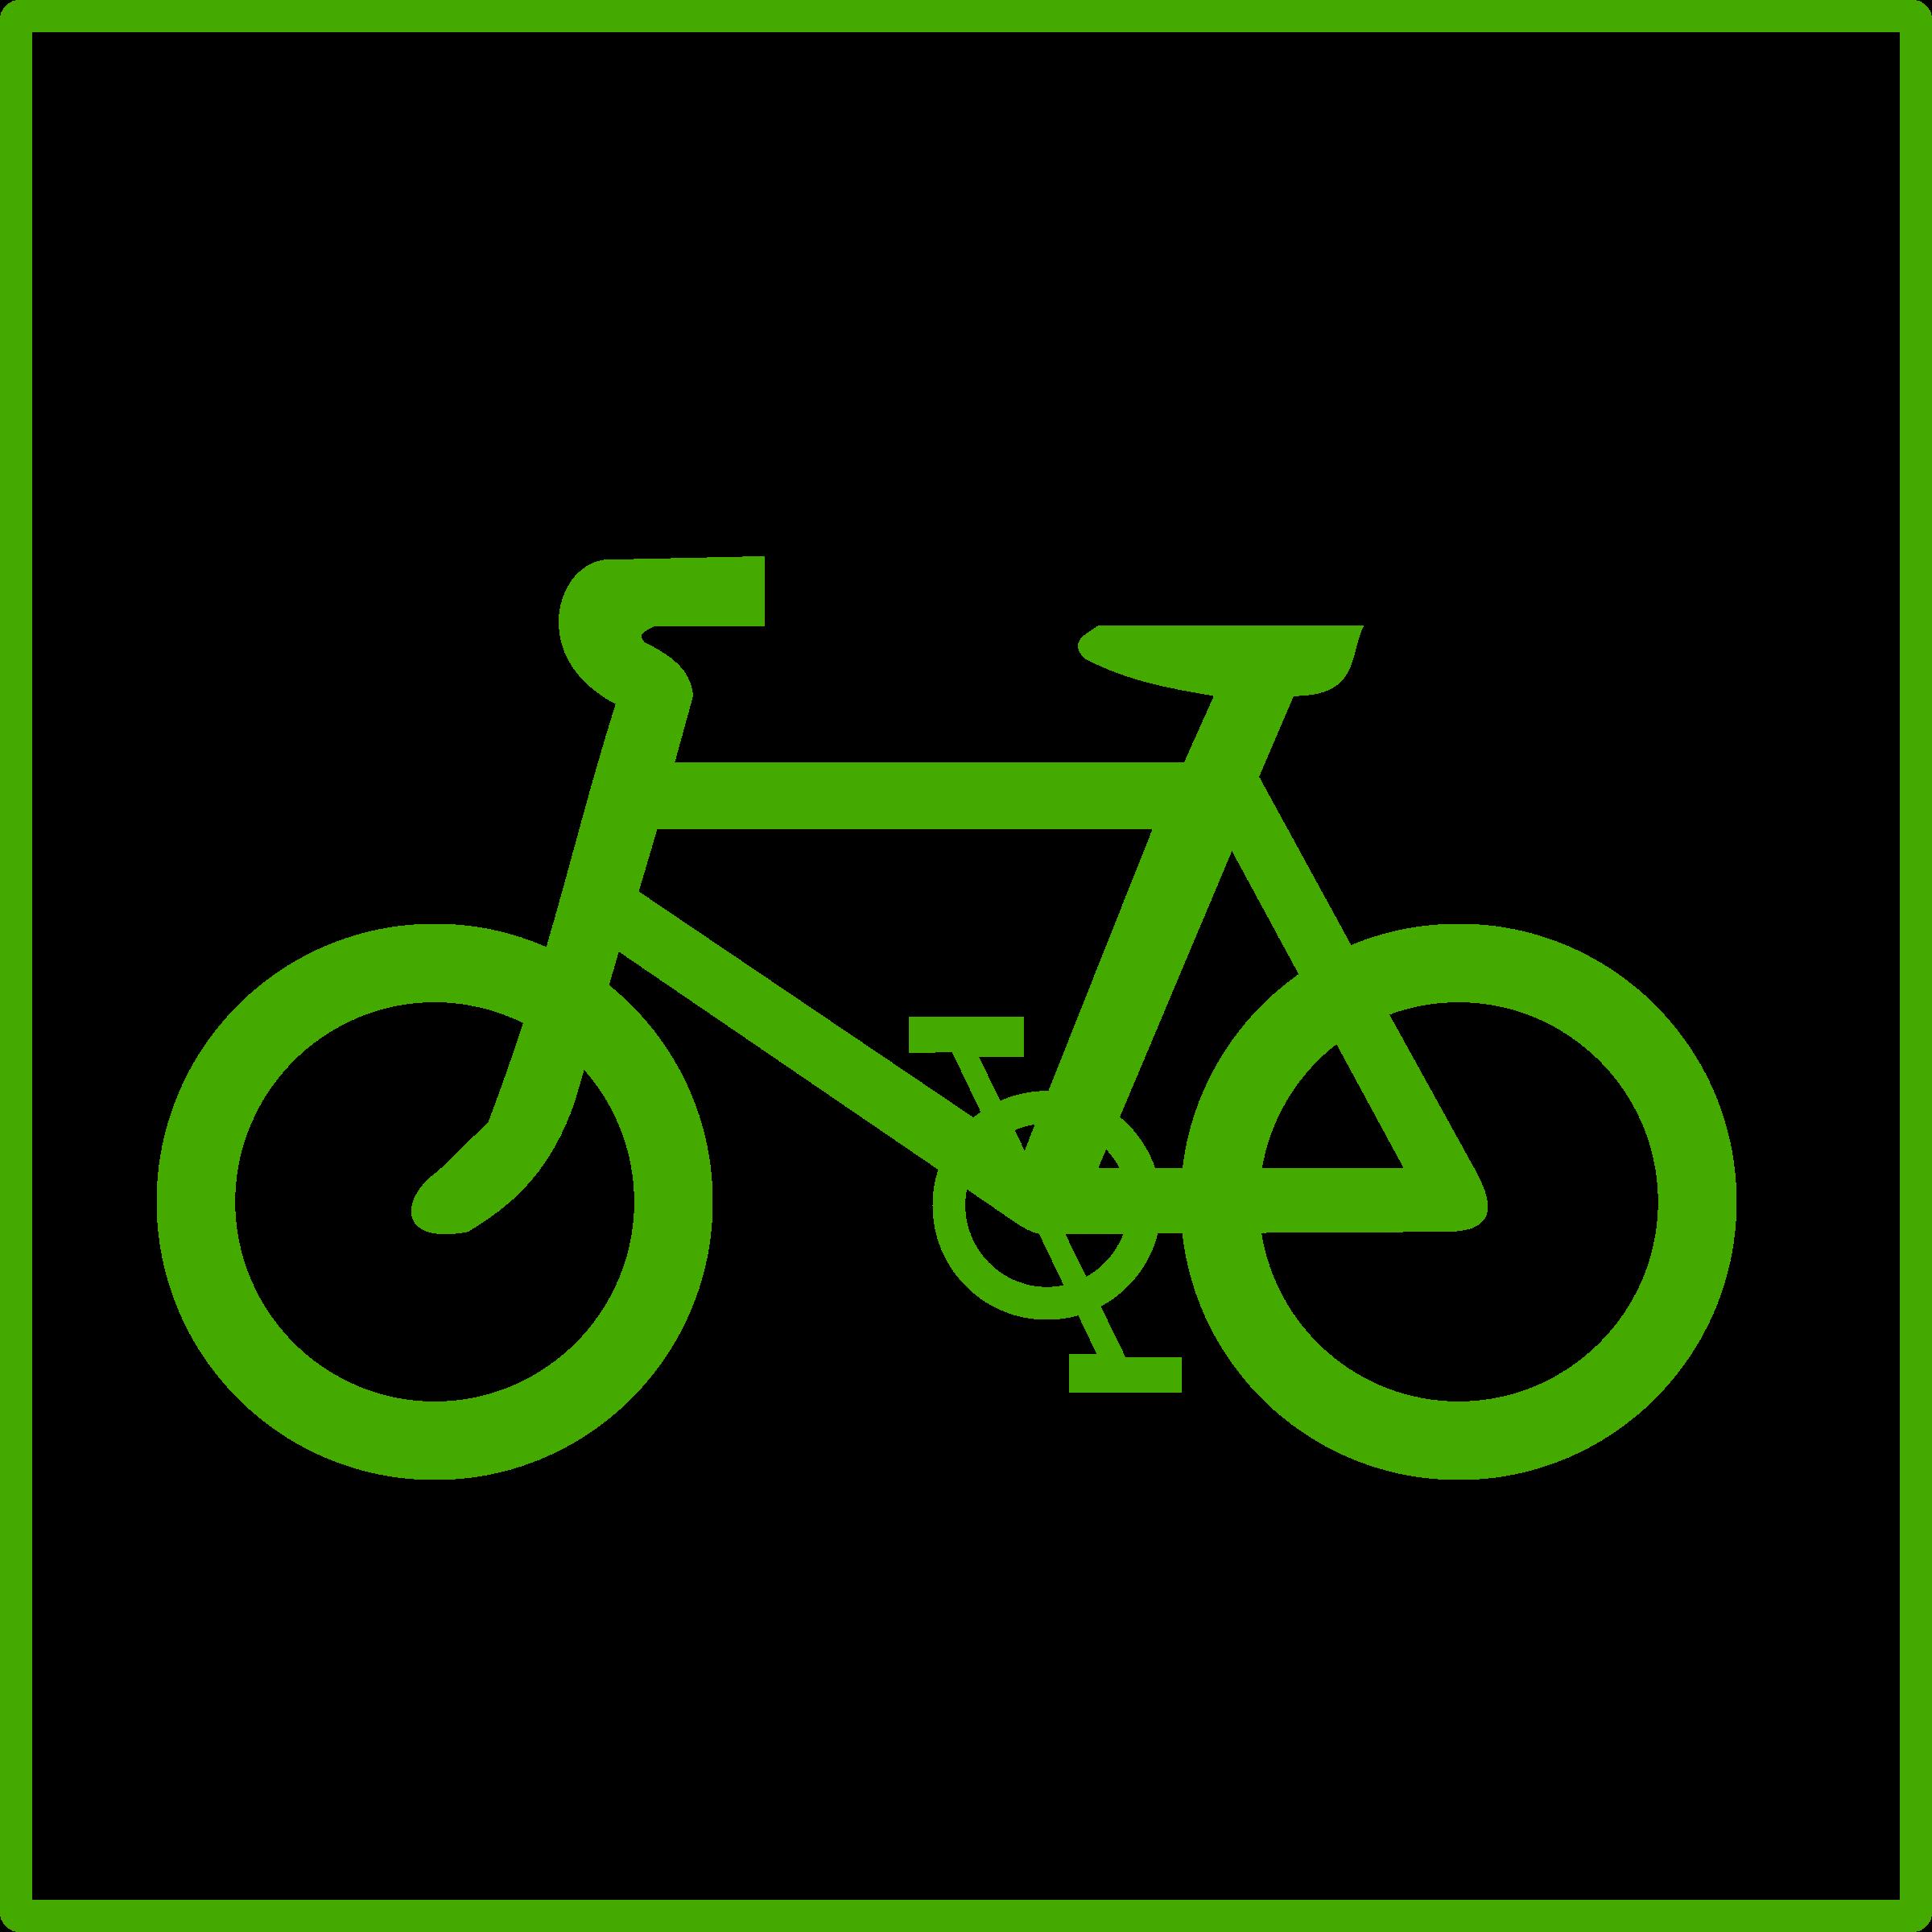 Bicycle green bike